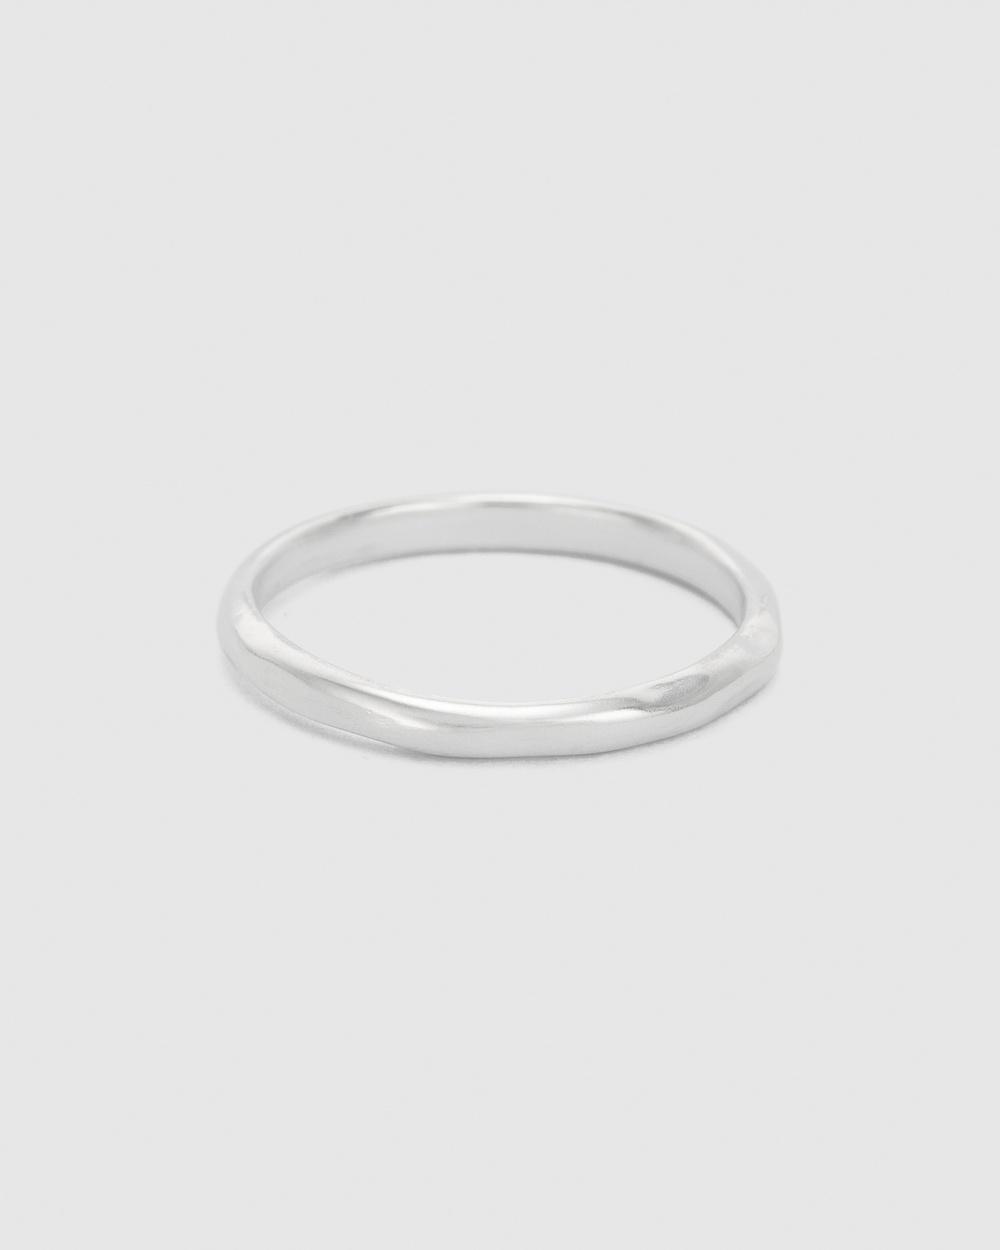 Kirstin Ash Renewal Stacking Ring Jewellery Silver